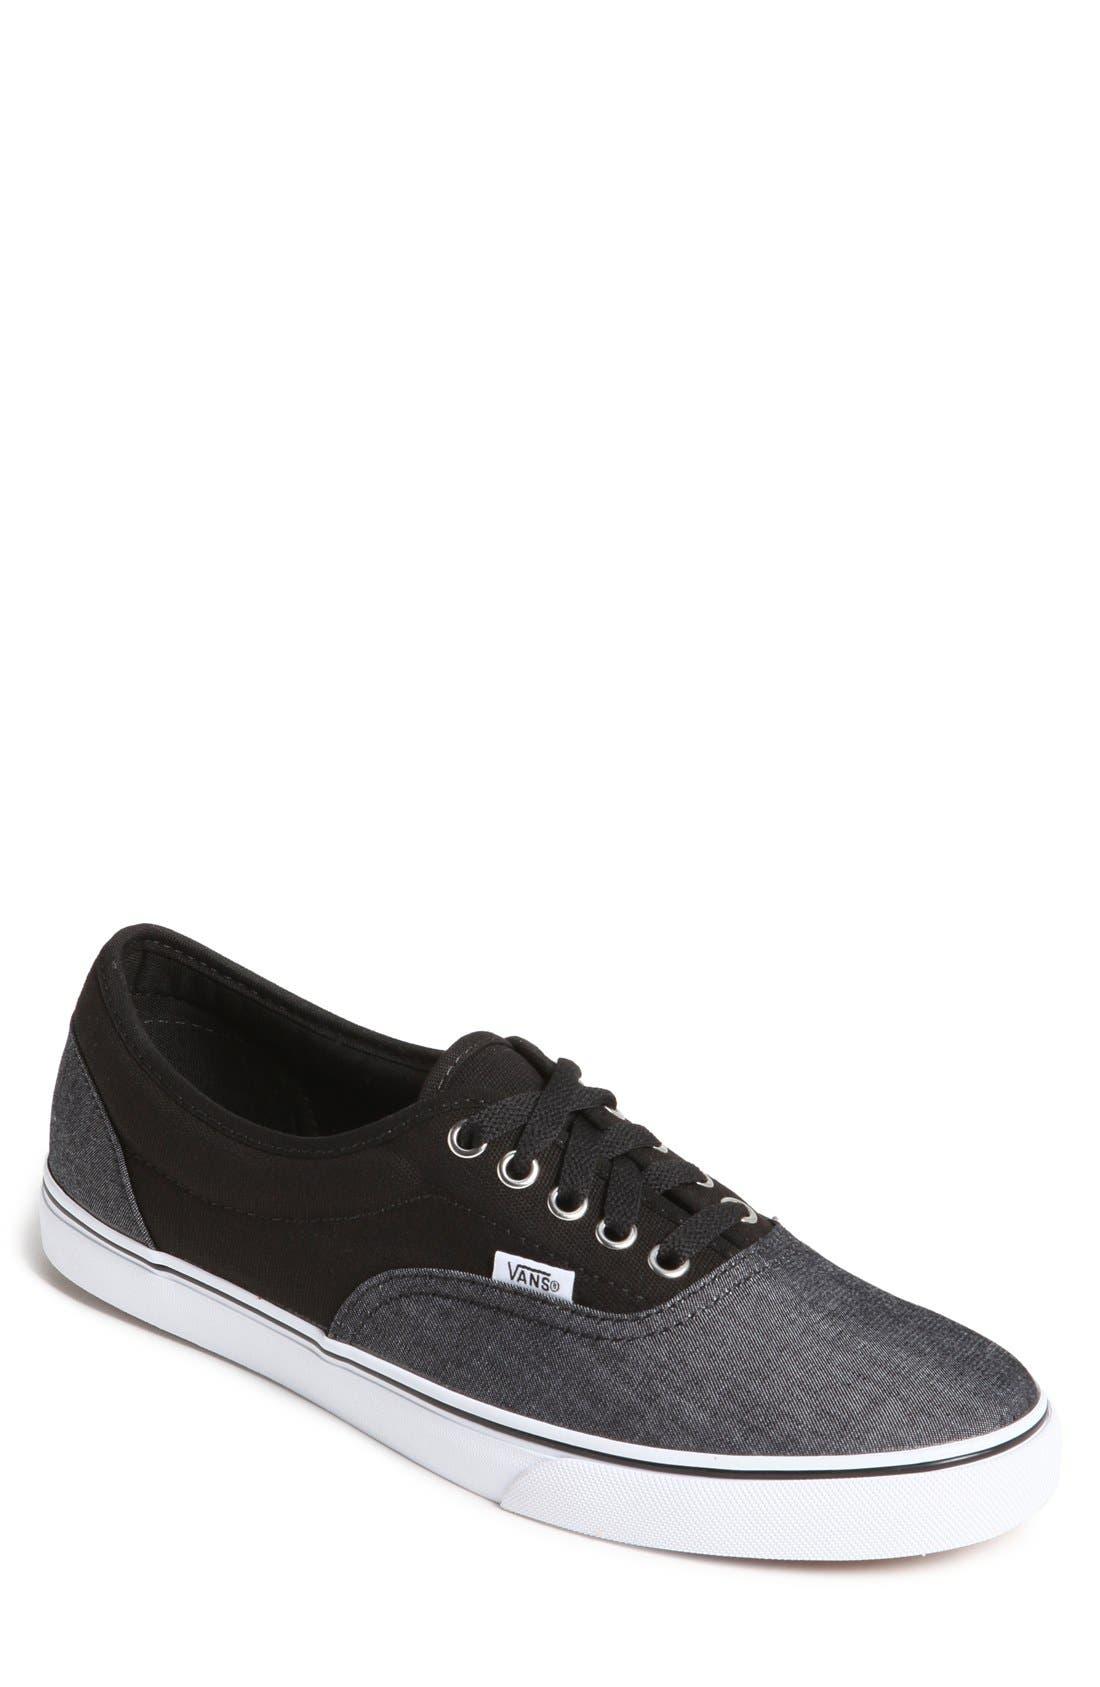 Main Image - Vans 'LPE' Sneaker (Men)